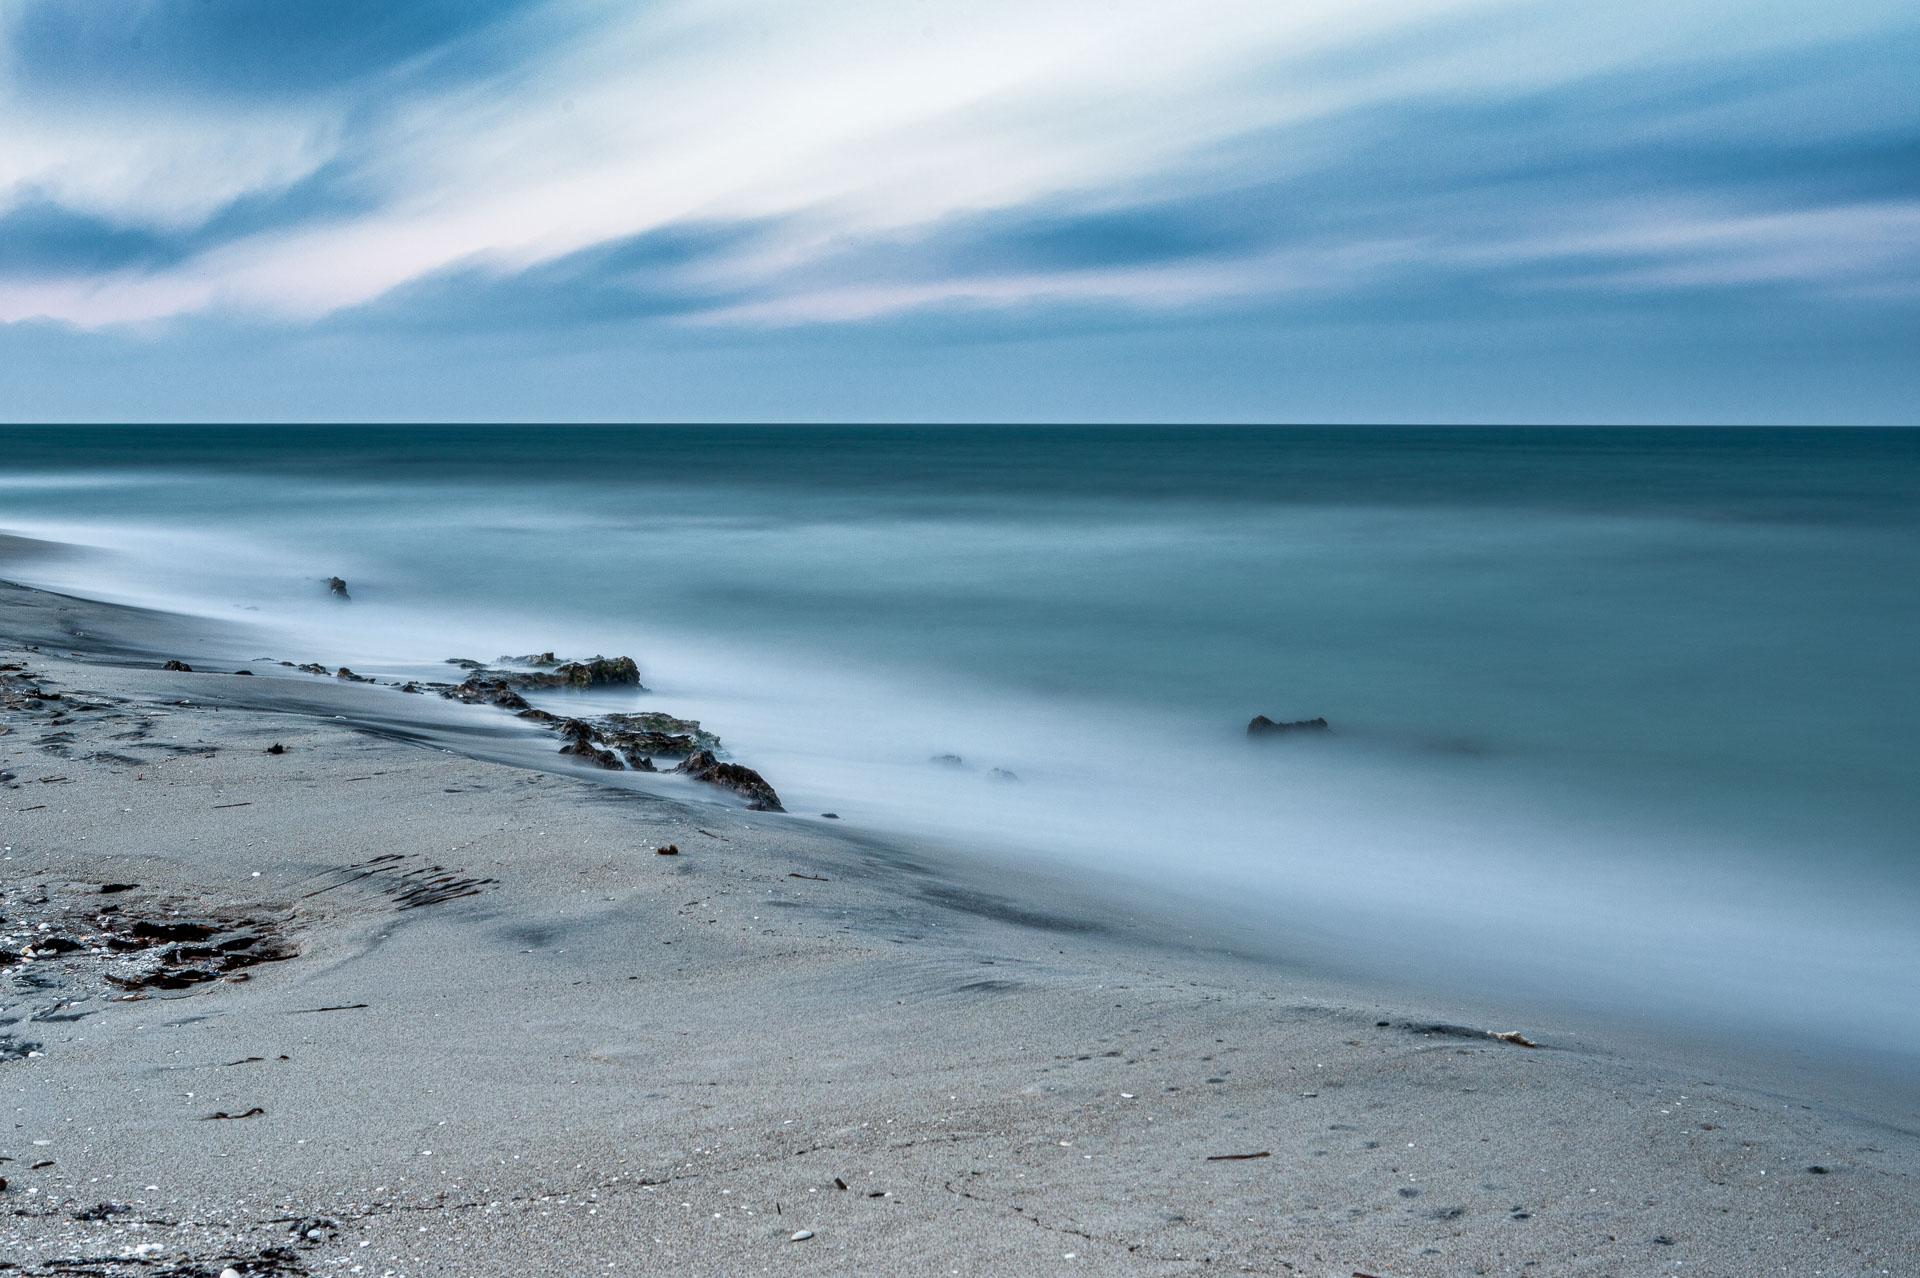 Il mare d'inverno, seascape long exposure photography